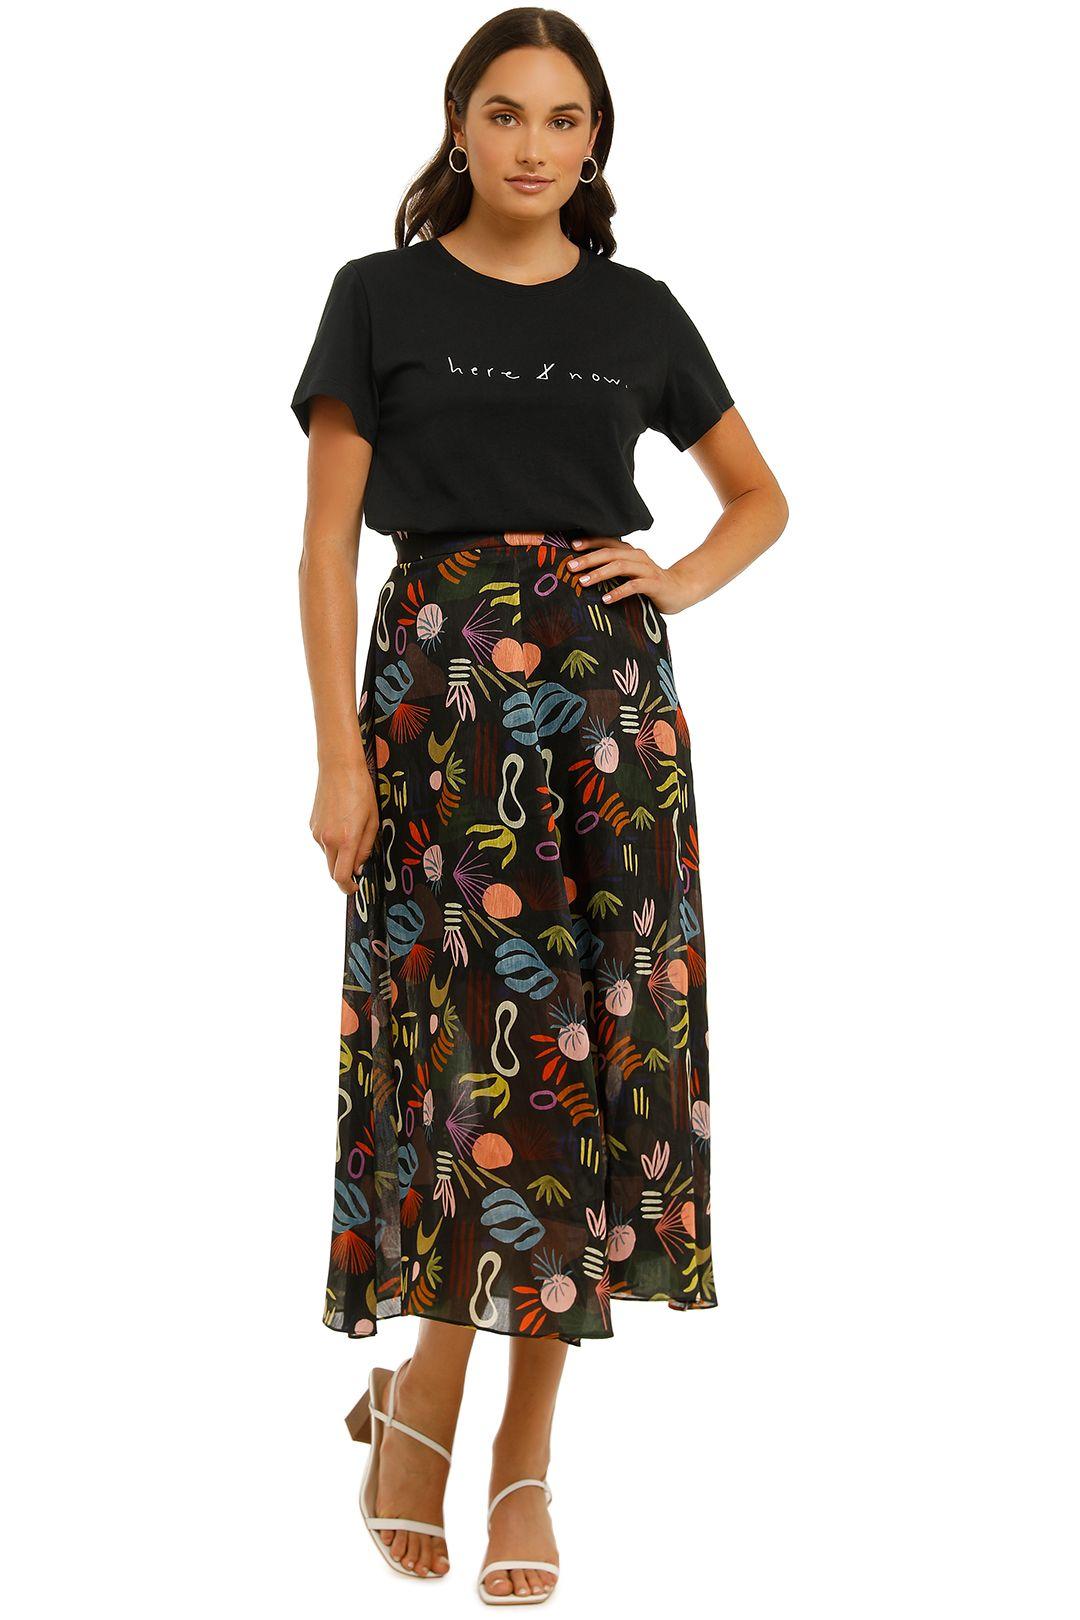 Ginger-and-Smart-Synchronize-Skirt-Front